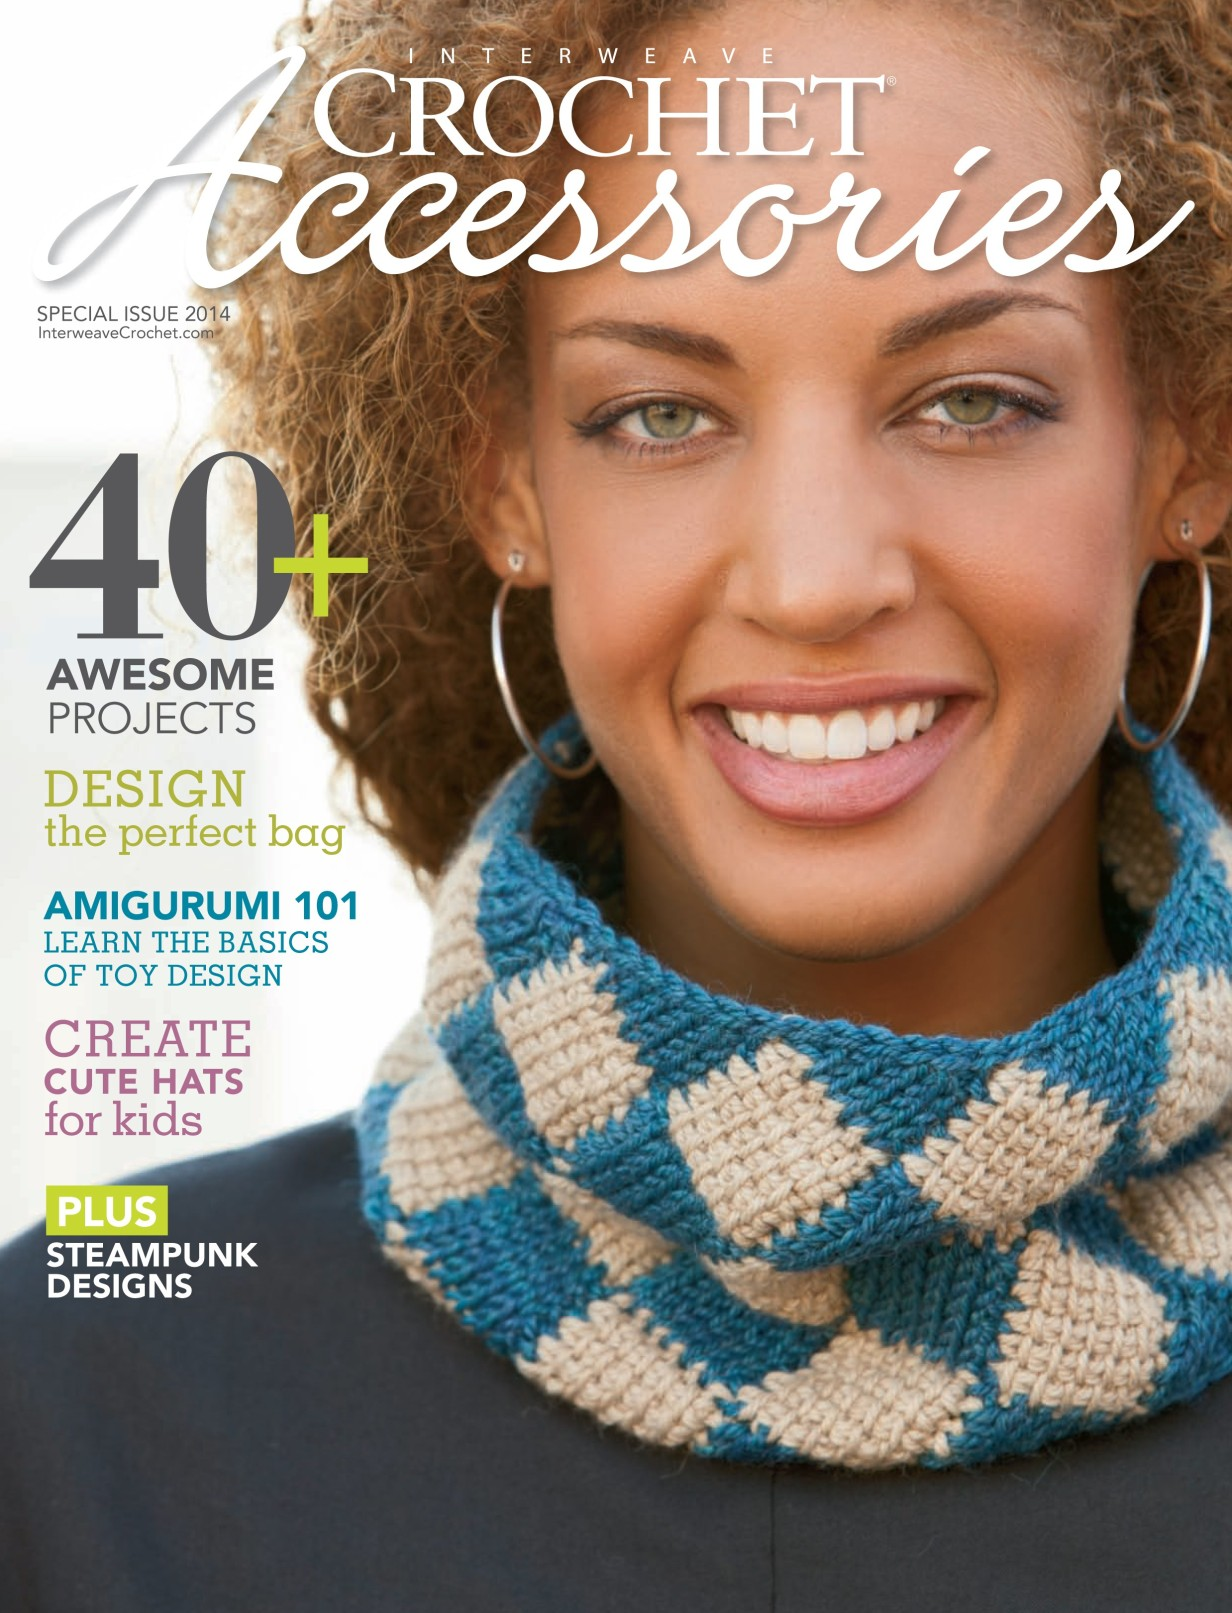 cuello - Técnica de cuello a crochet Int_weave_crochet_acc2013